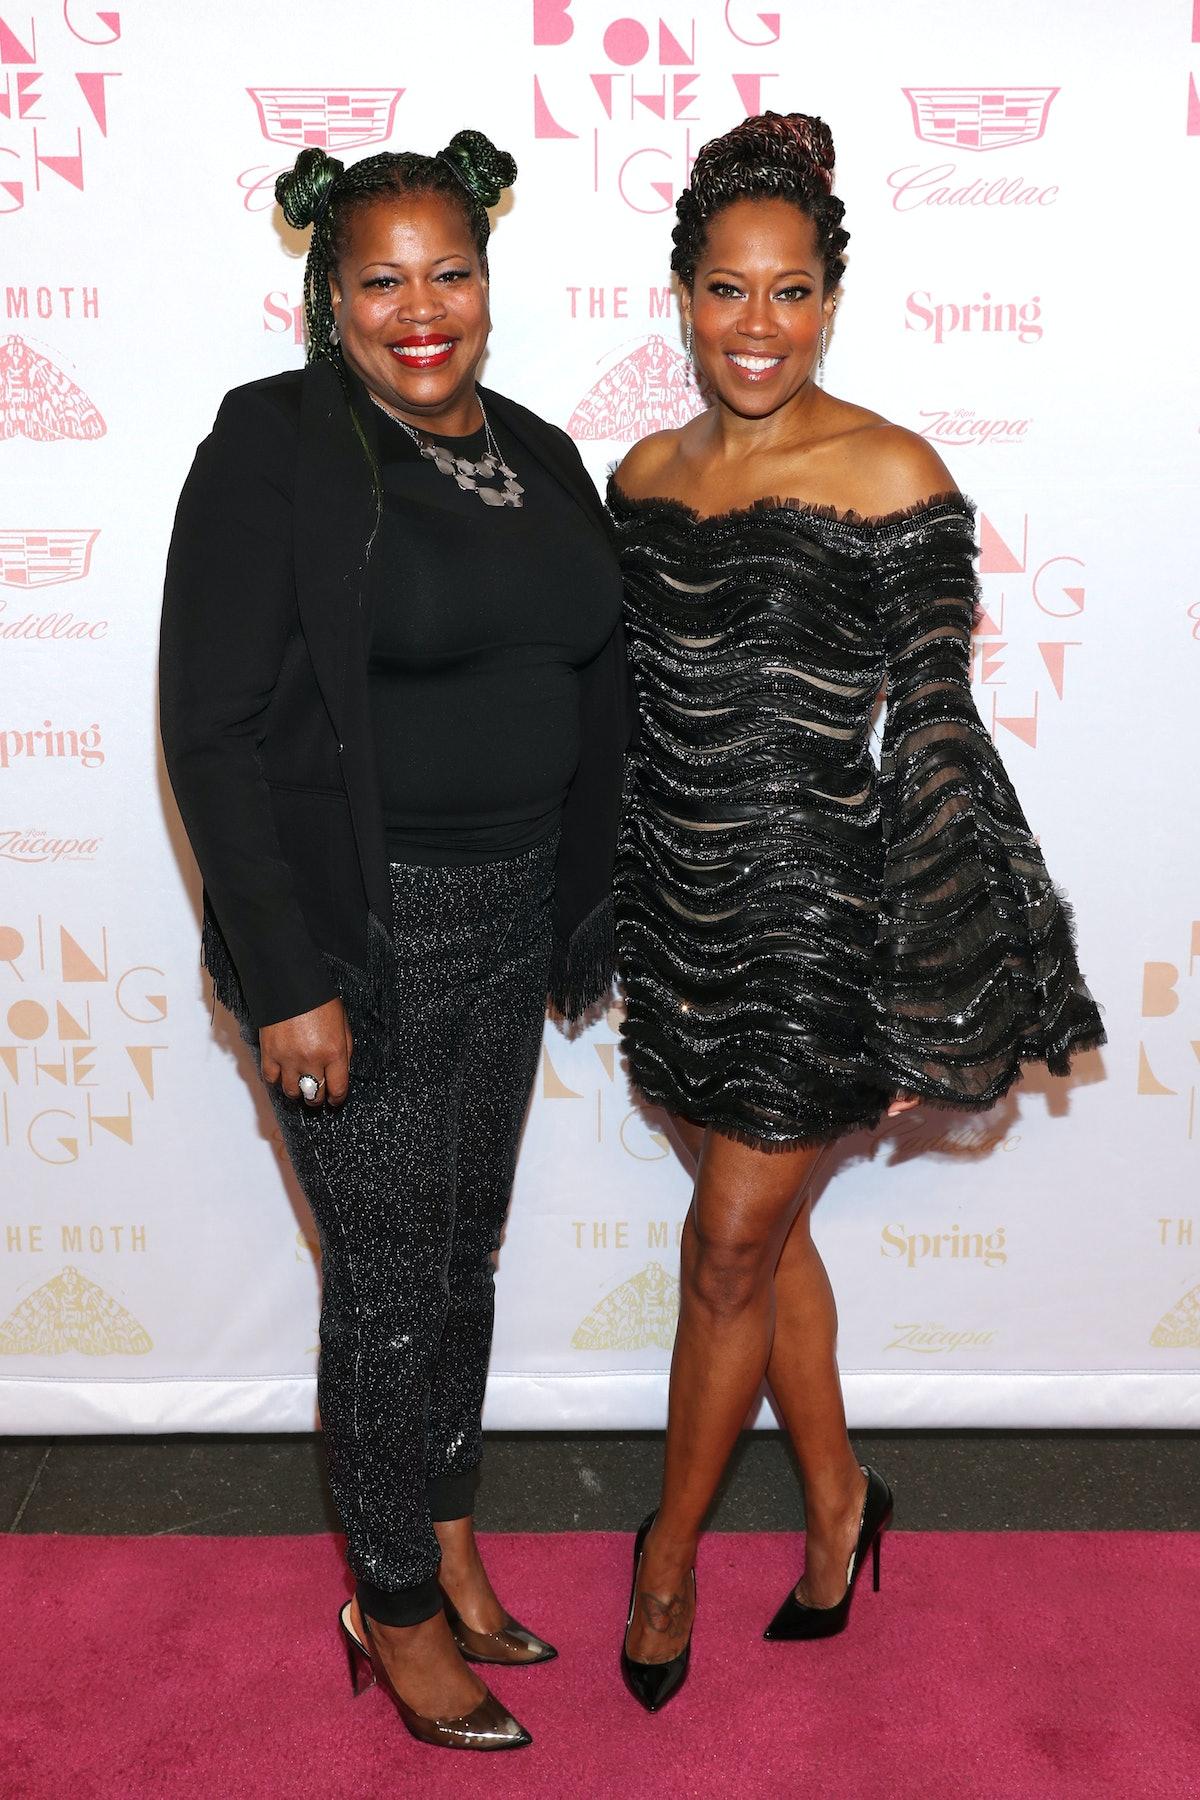 Linda and Regina King posing on the red carpet